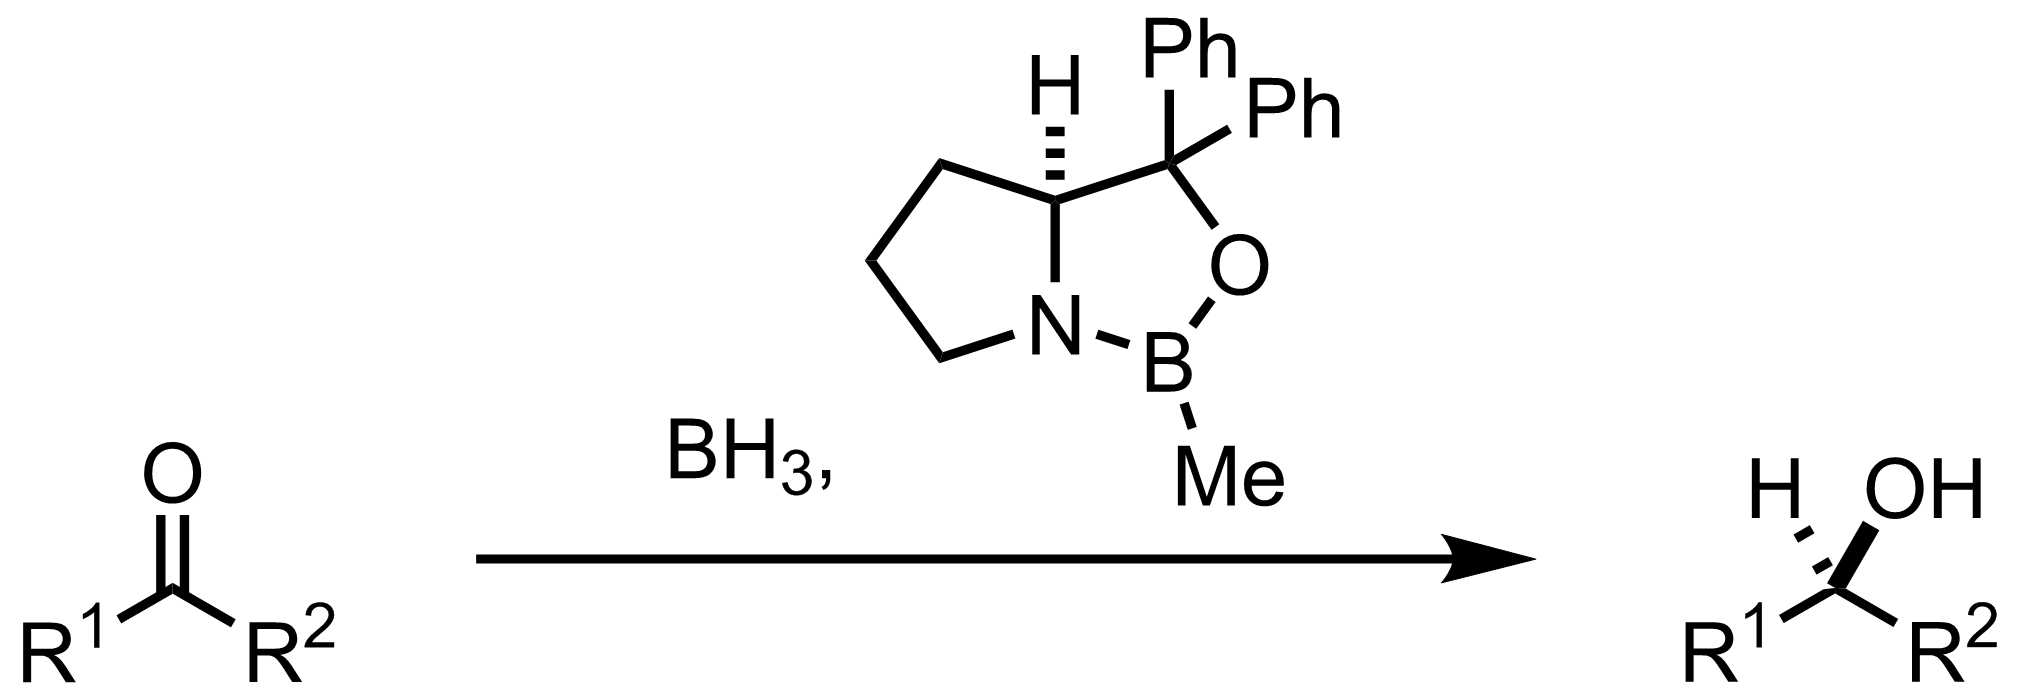 Schematic representation of the Corey-Itsuno Reaction.